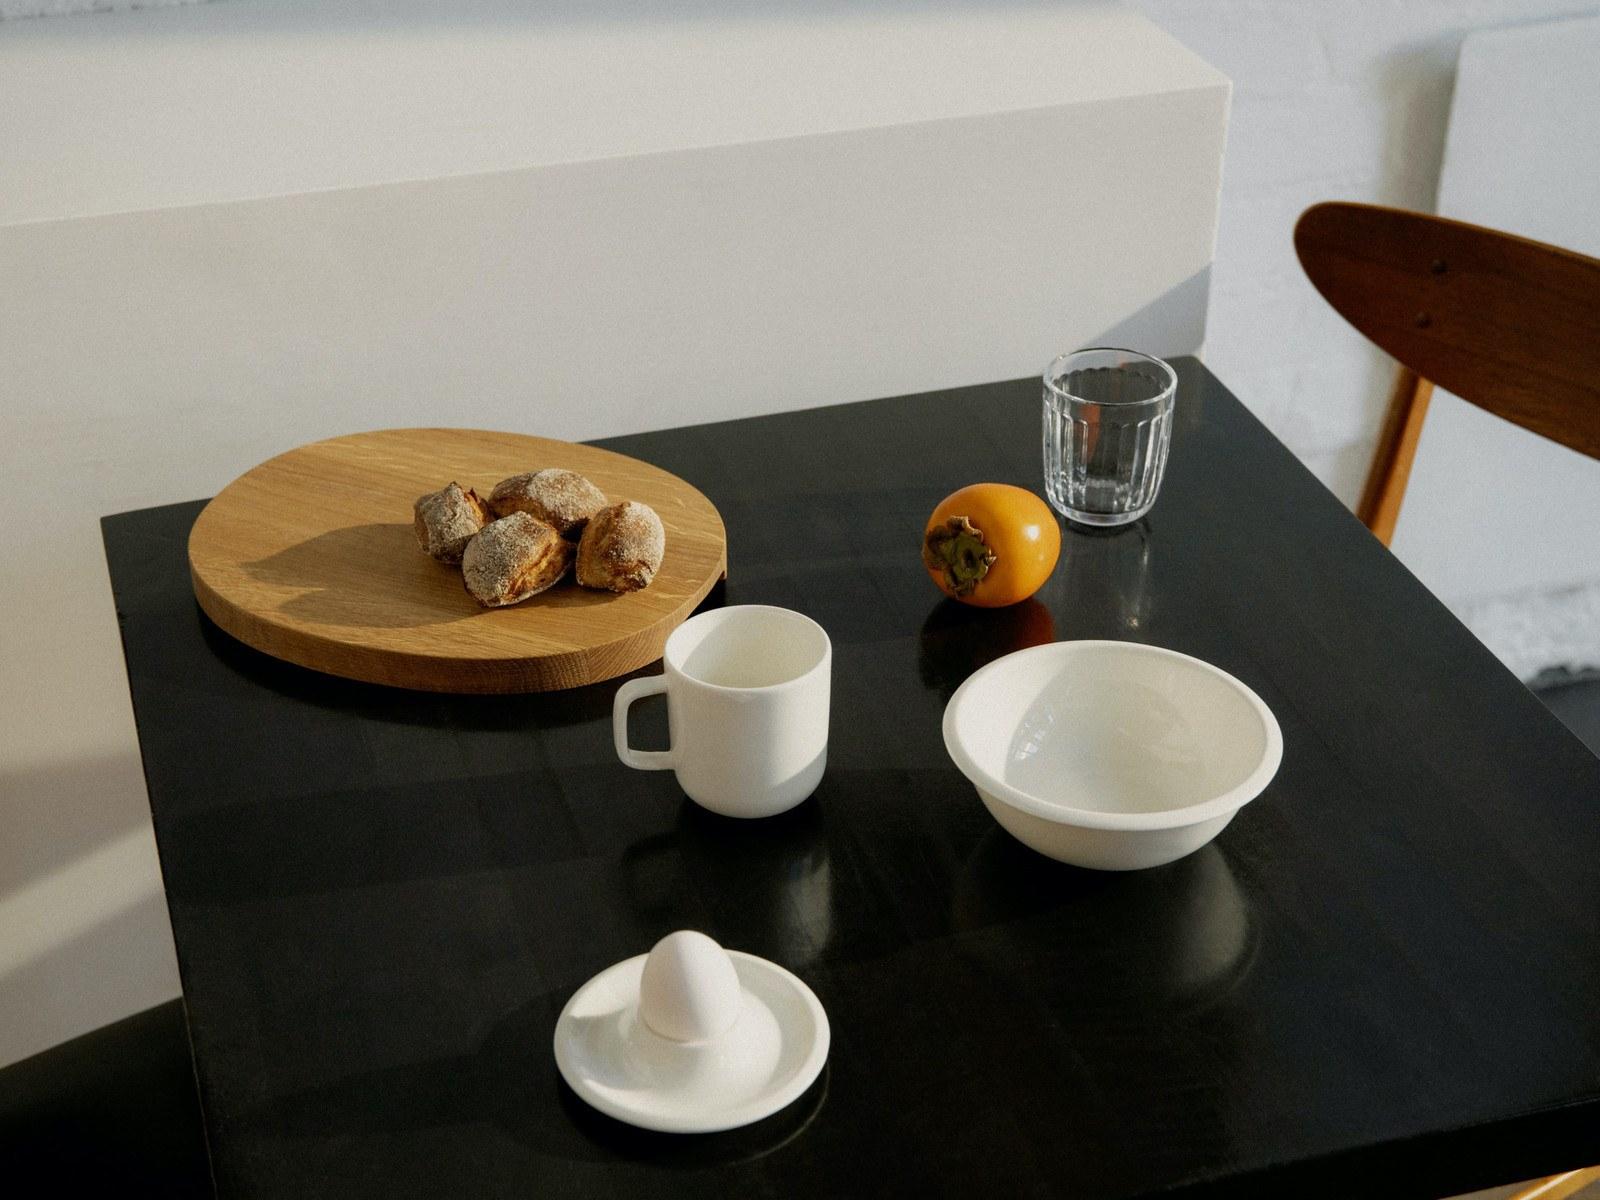 Küchenaccessoires: Gut sortiert ist halb gekocht